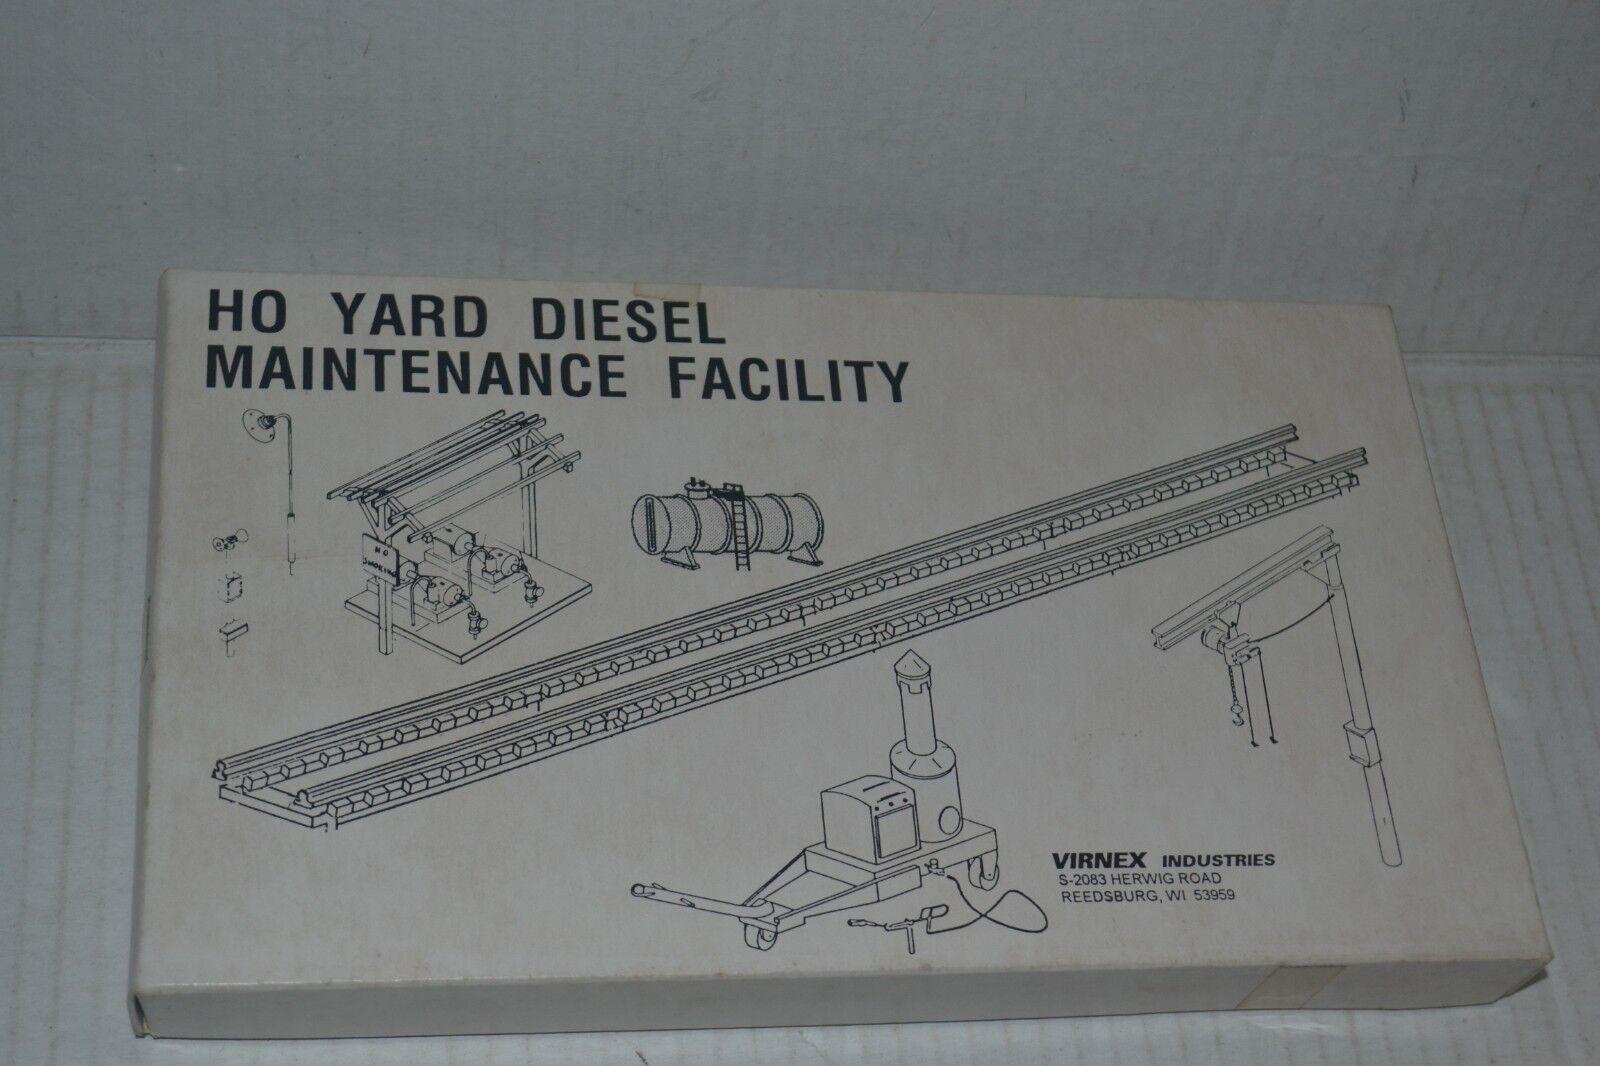 Stewart Virnex 211 Ho Yard Diesel Maintenance Facility Craftsuomo Style Kit